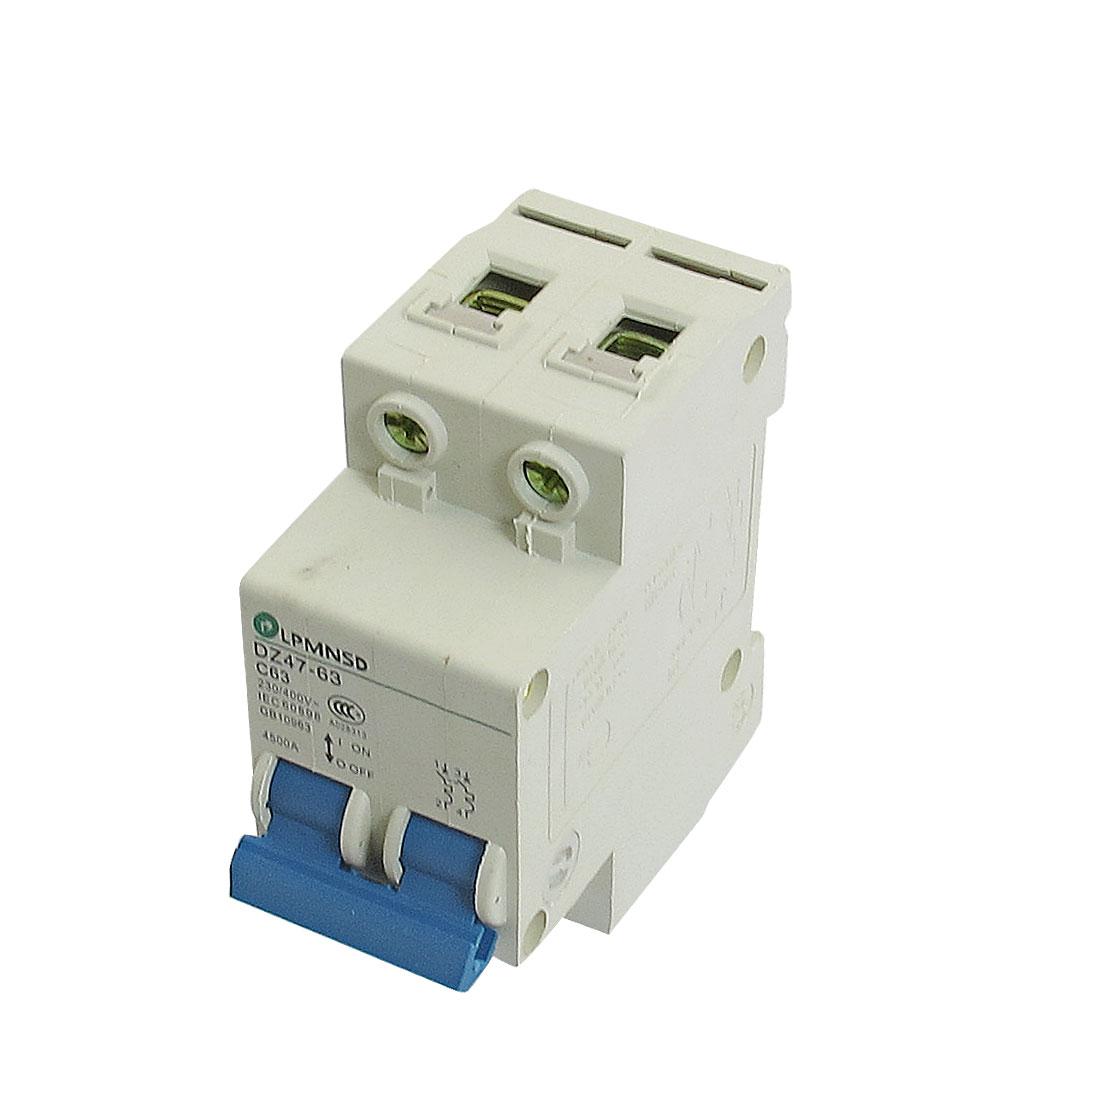 DZ47-63 C63 63A 230/400VAC 4500A Breaking Capacity 2 Poles Circuit Breaker